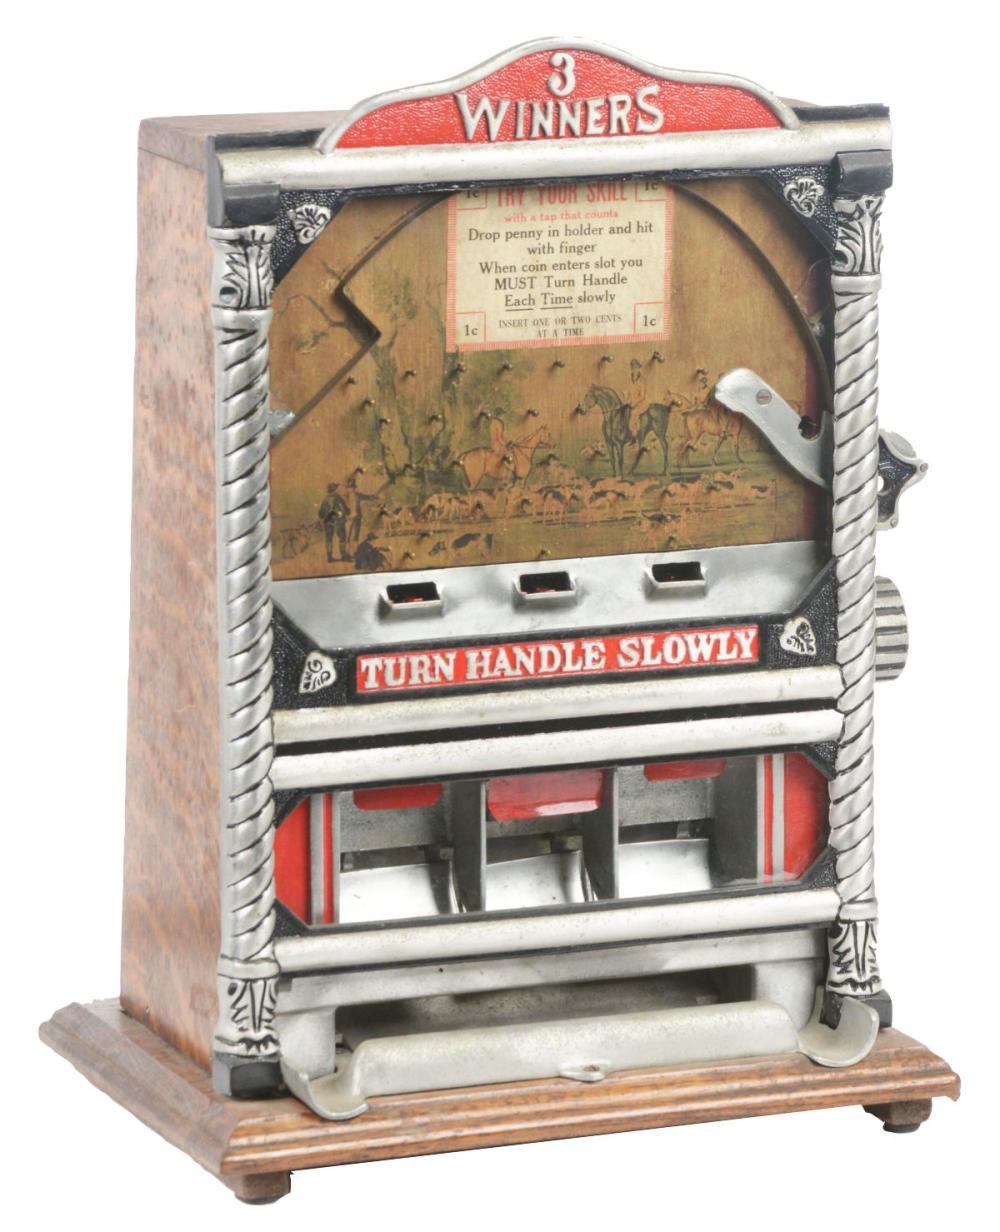 1¢ ROCK-OLA MFG. THREE WINNERS COUNTER POCKET TRADE STIMULATOR.